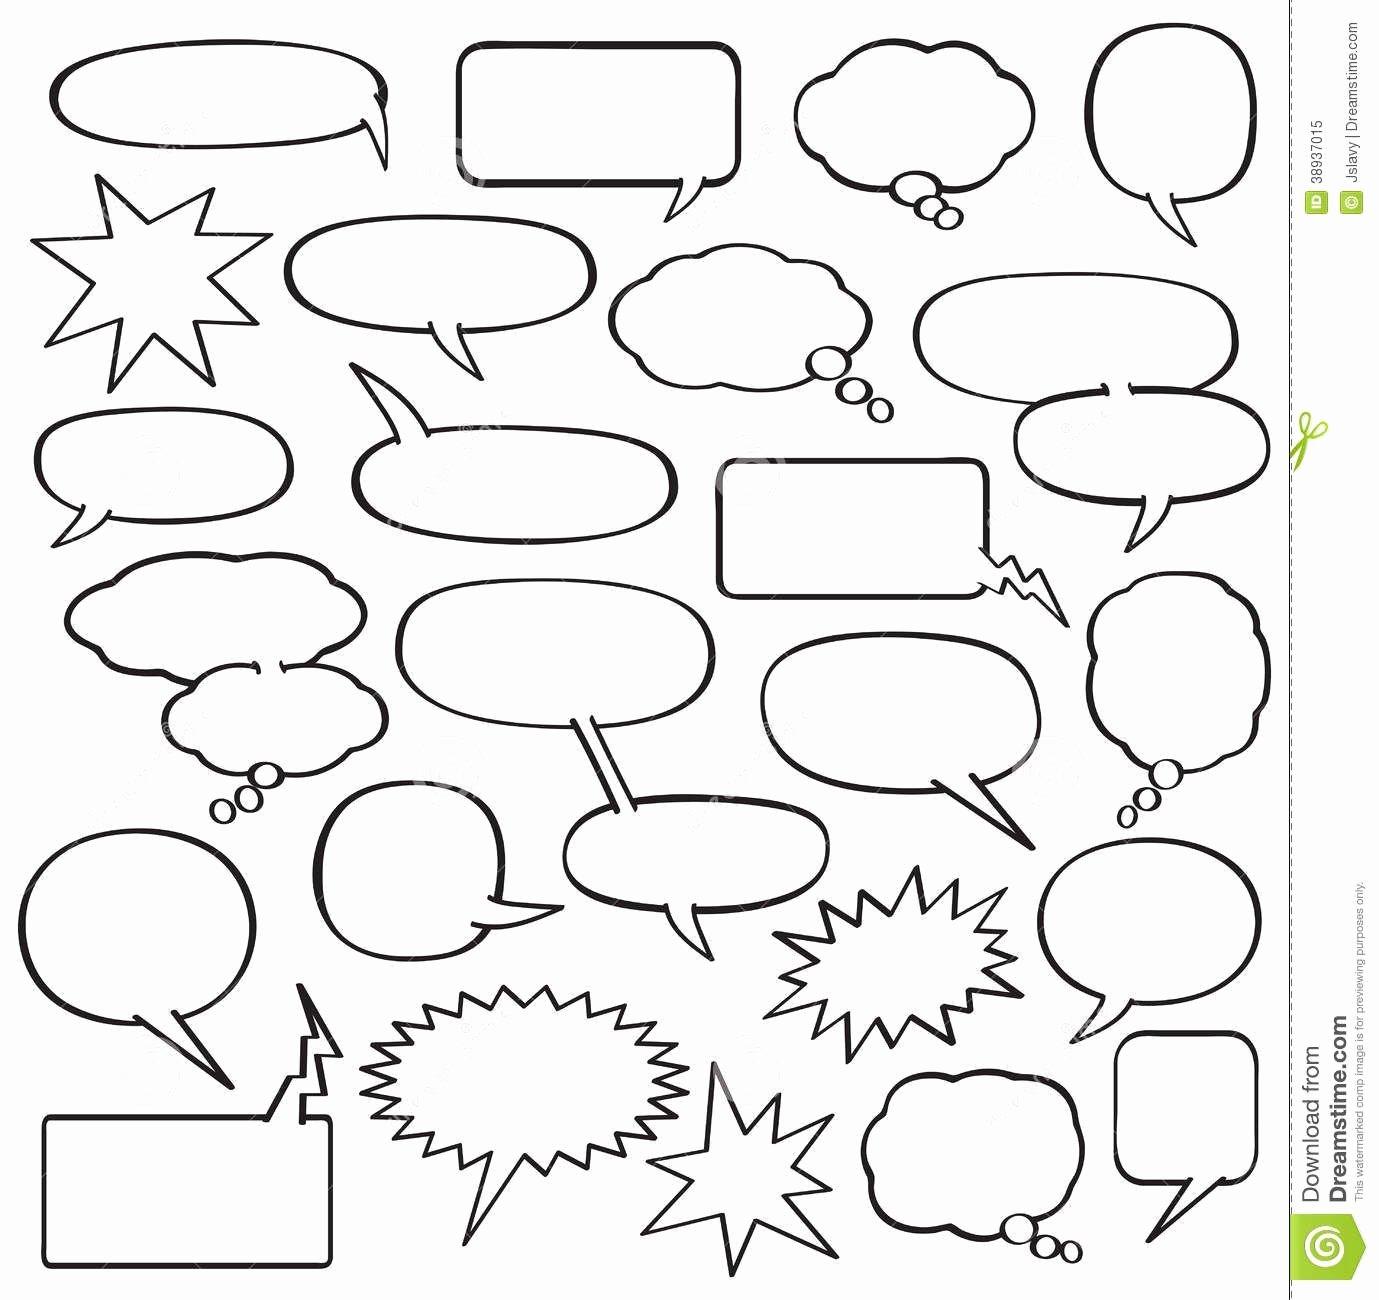 Comic Strip Template Word Beautiful Blank Ic Strip Speech Bubbles Template School